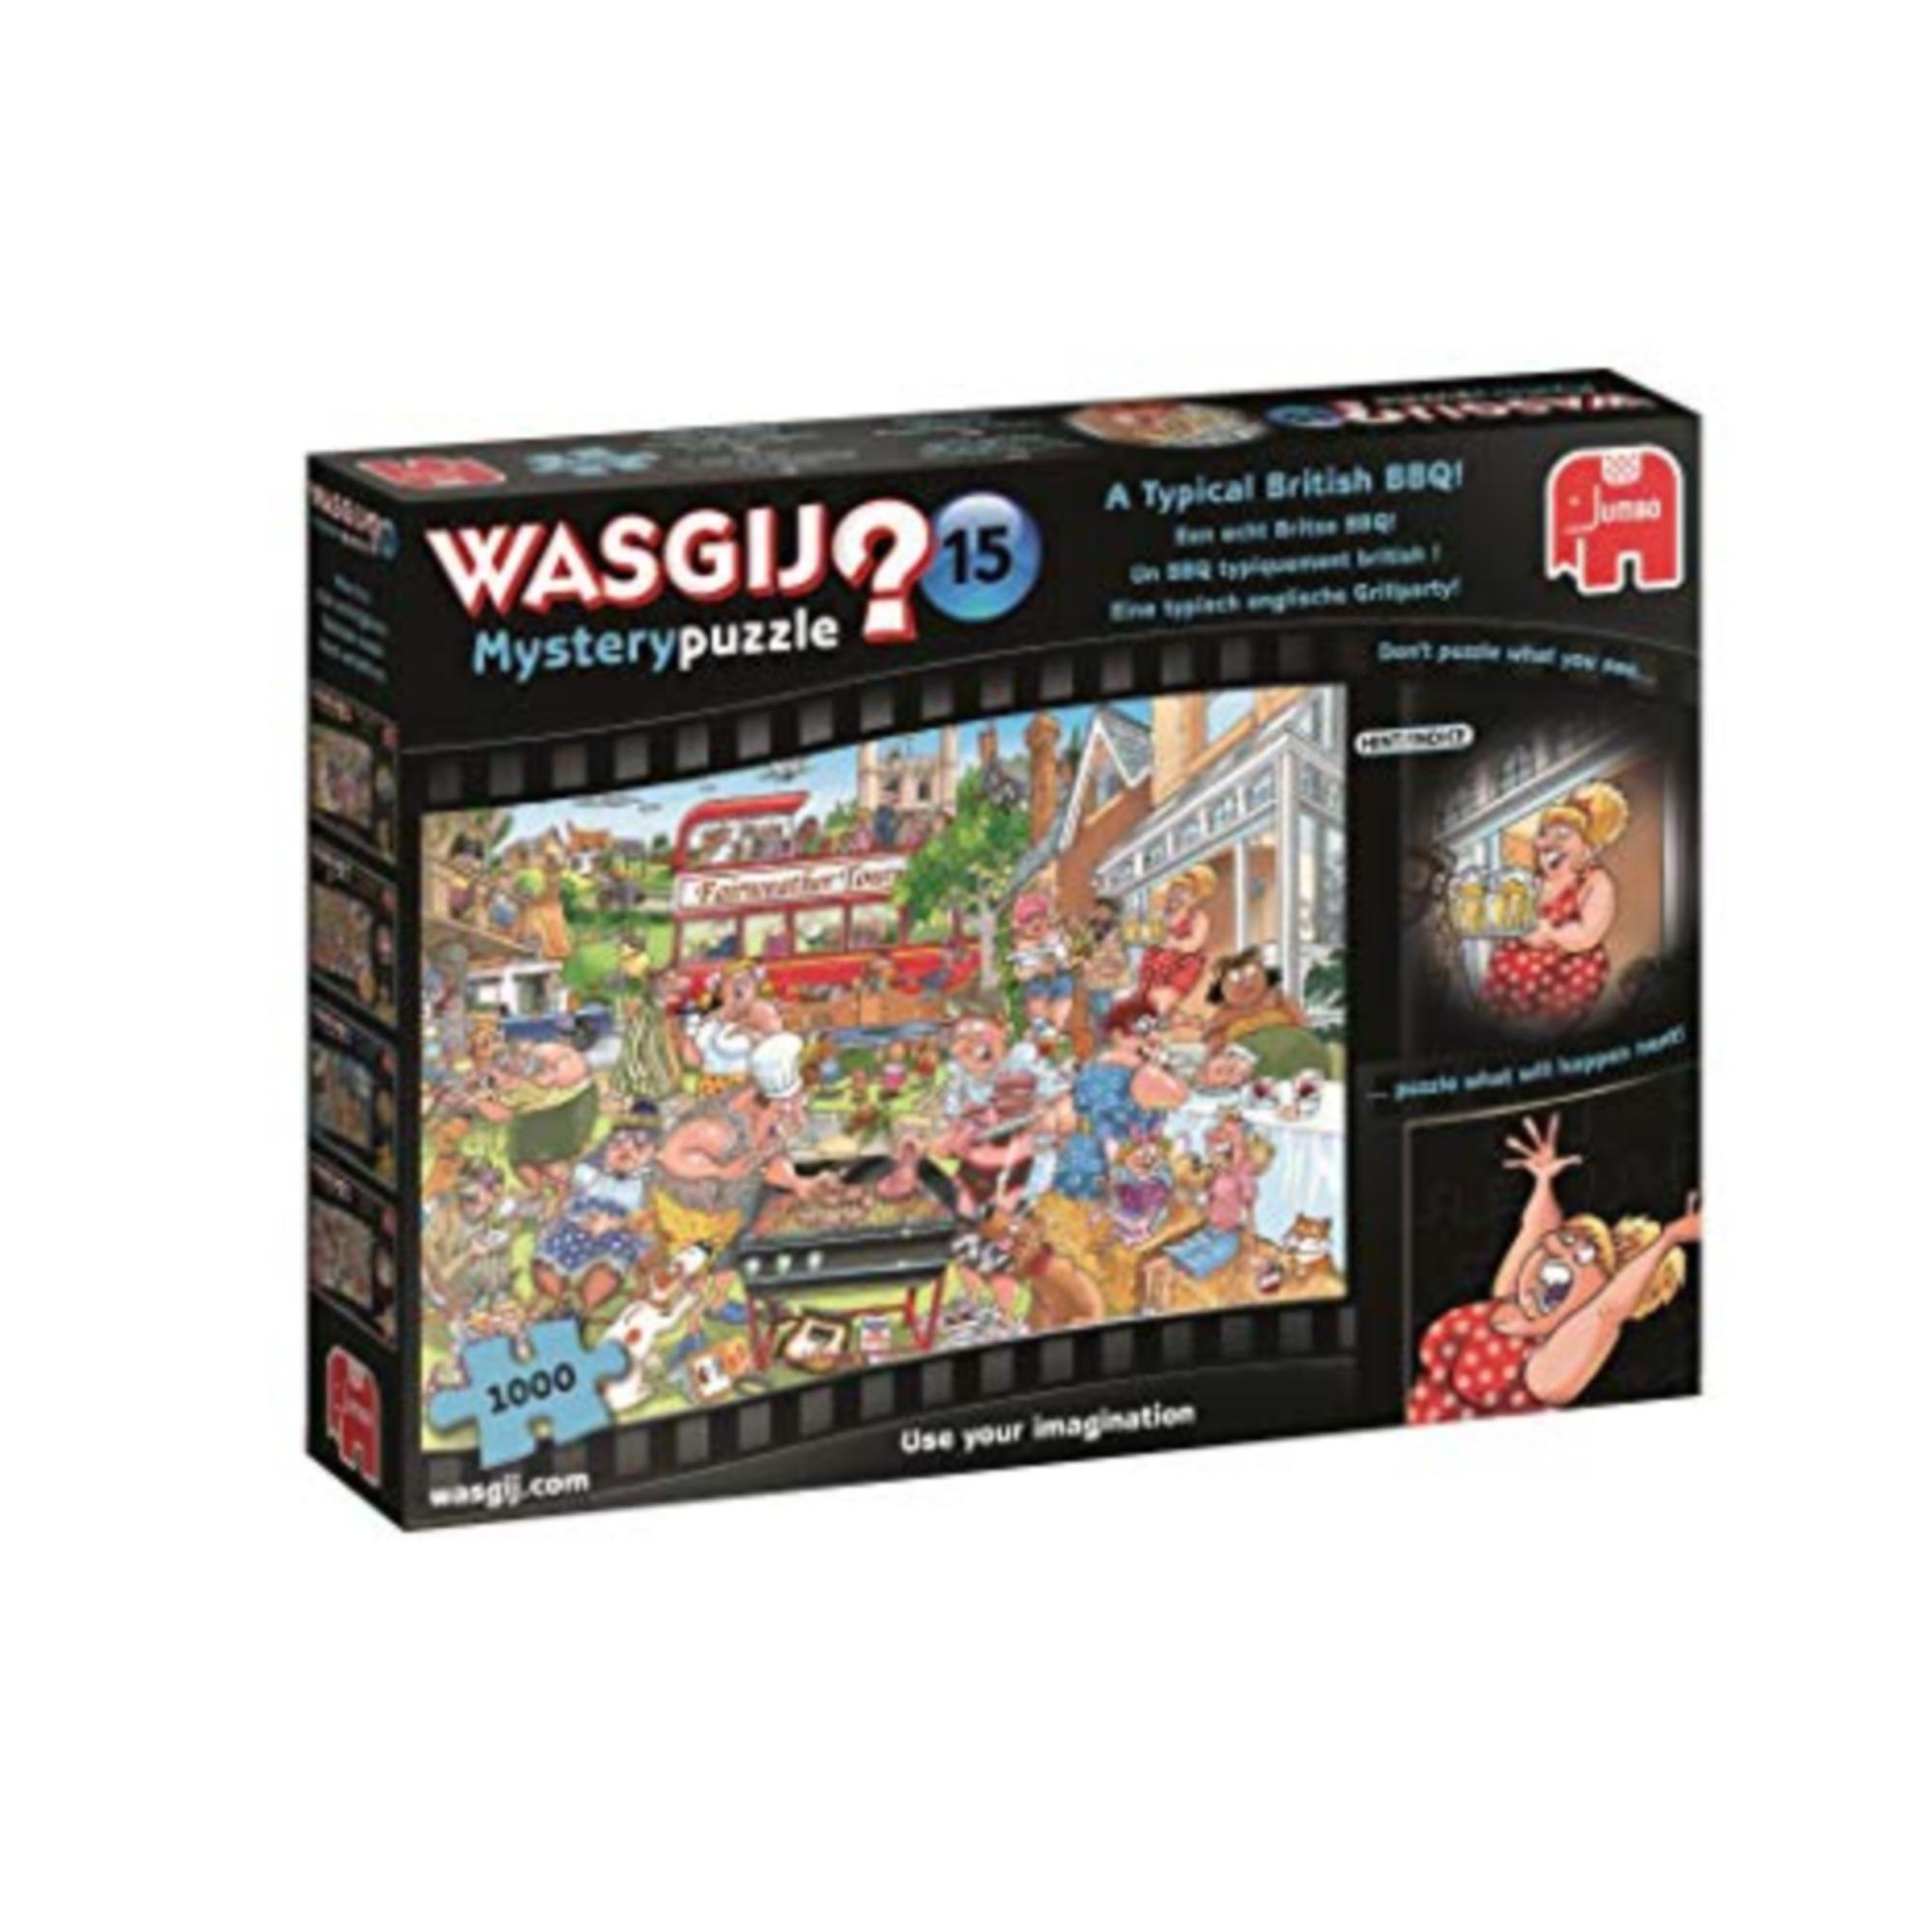 Wasgij Puzzle 1000: Wasgij Mystery #15 - BBQ typiquement british